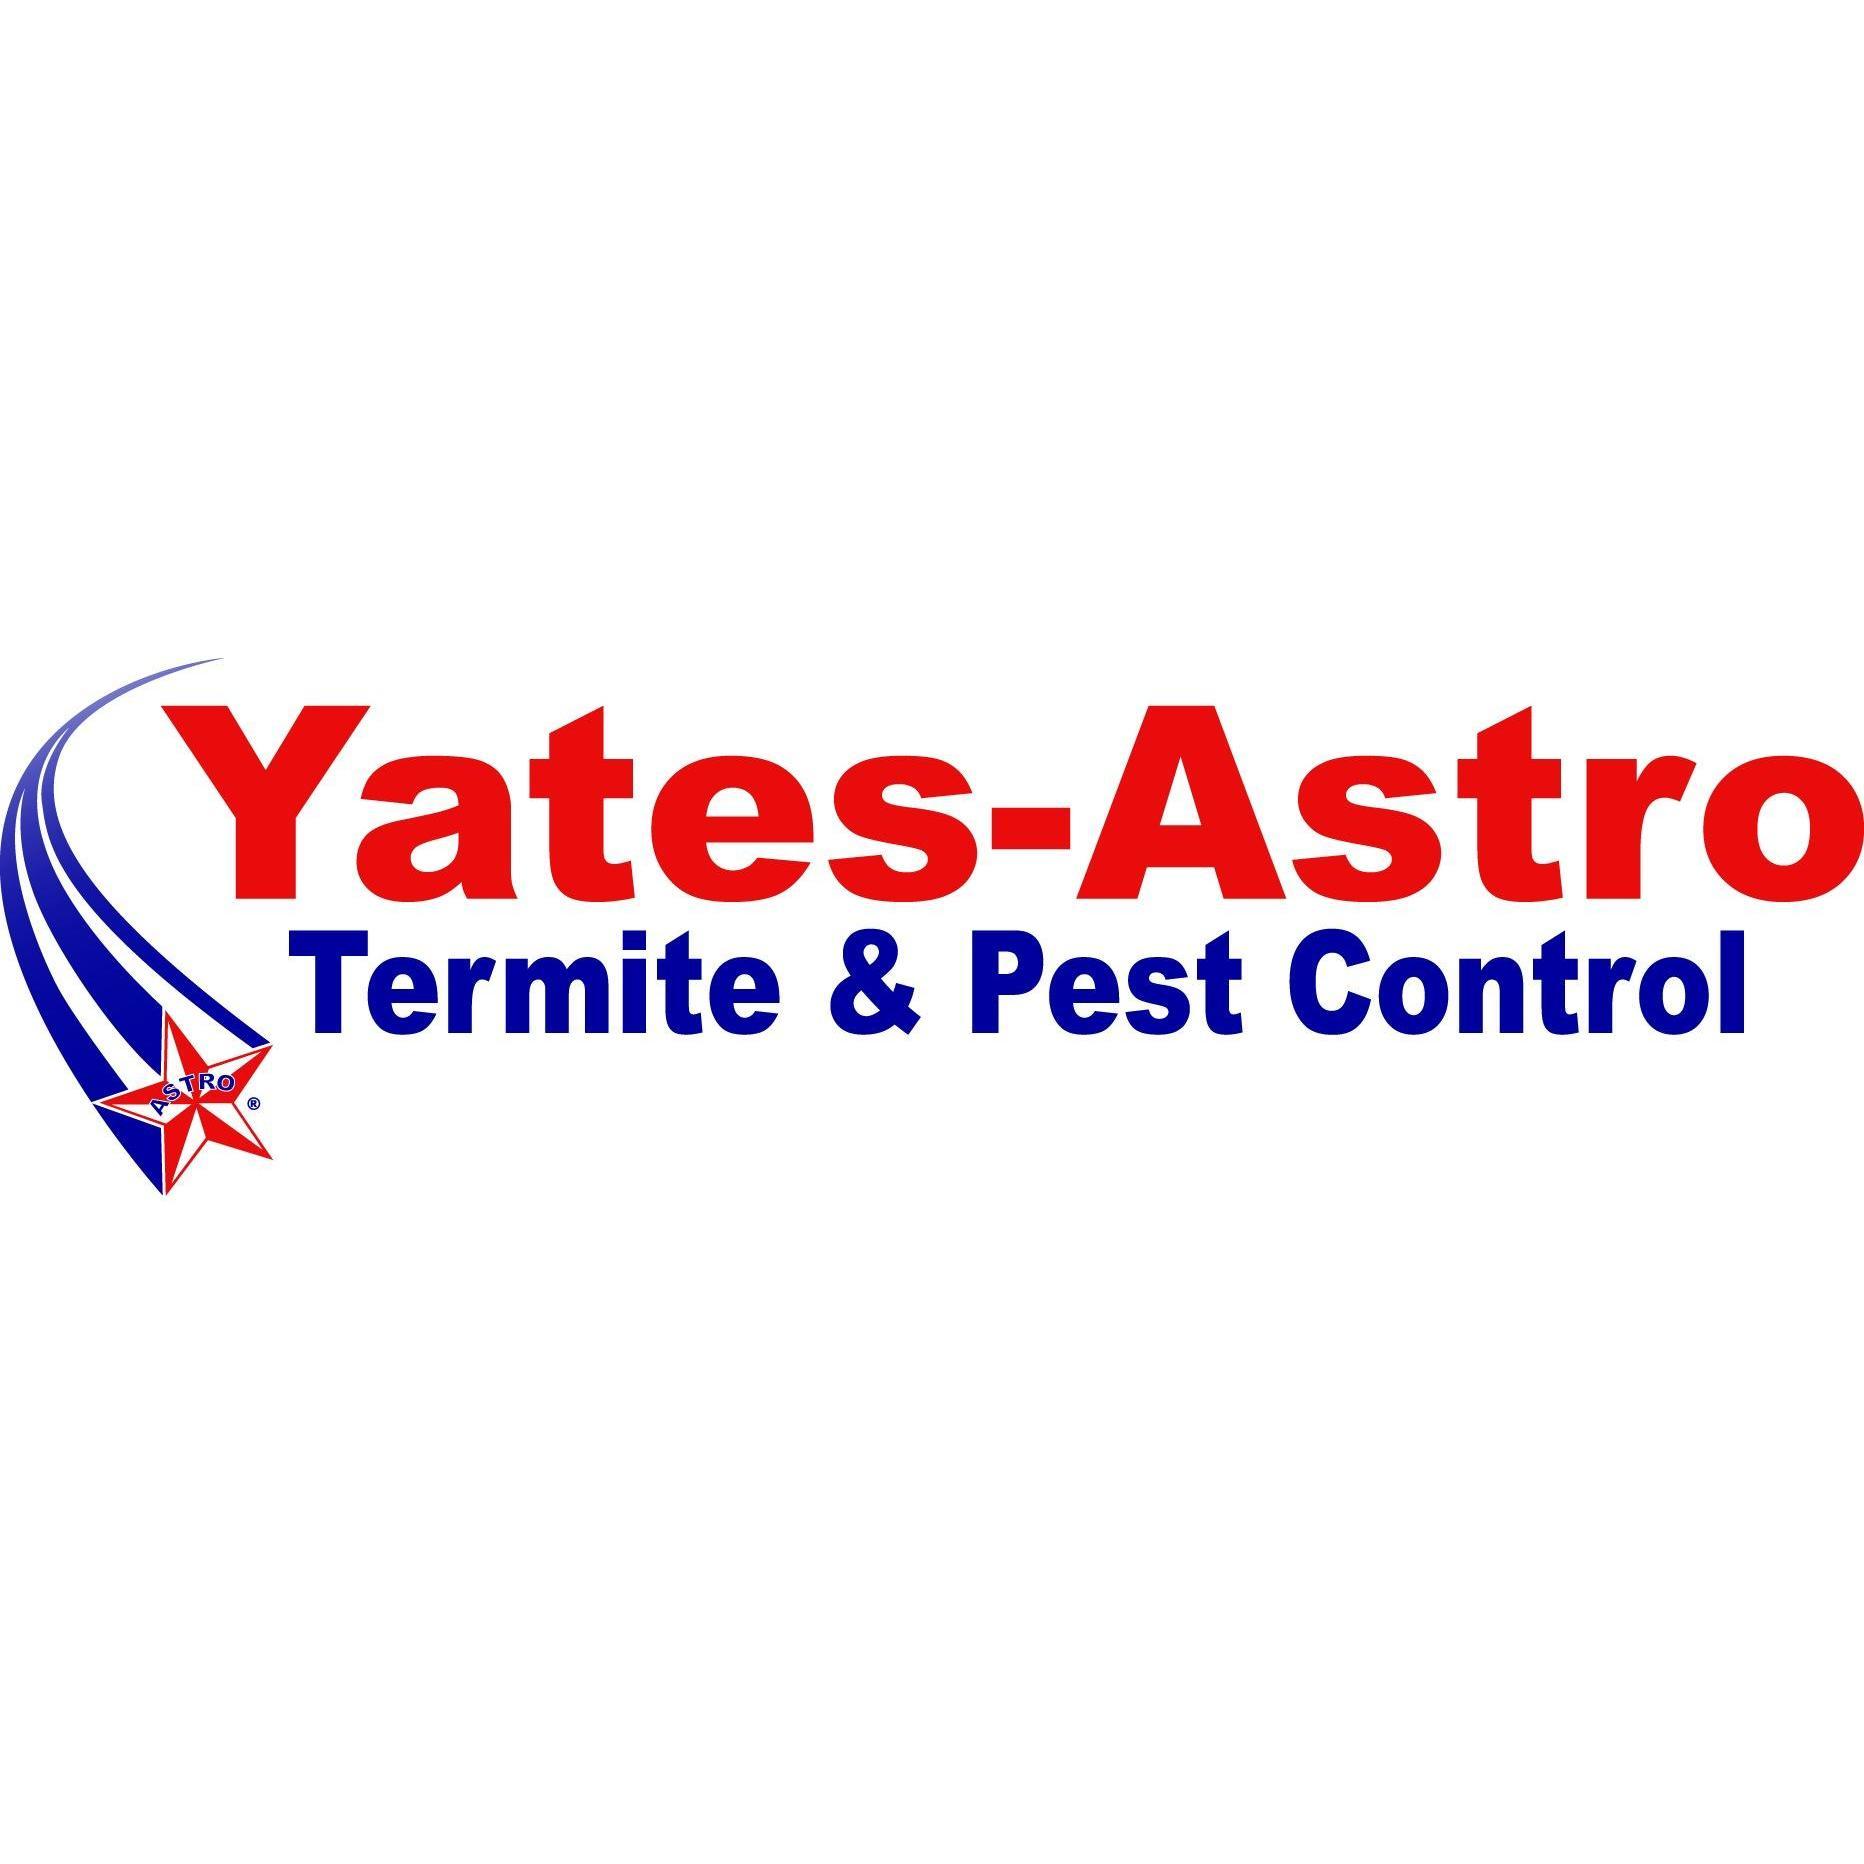 Yates-Astro Termite and Pest Control - Statesboro, GA - Pest & Animal Control